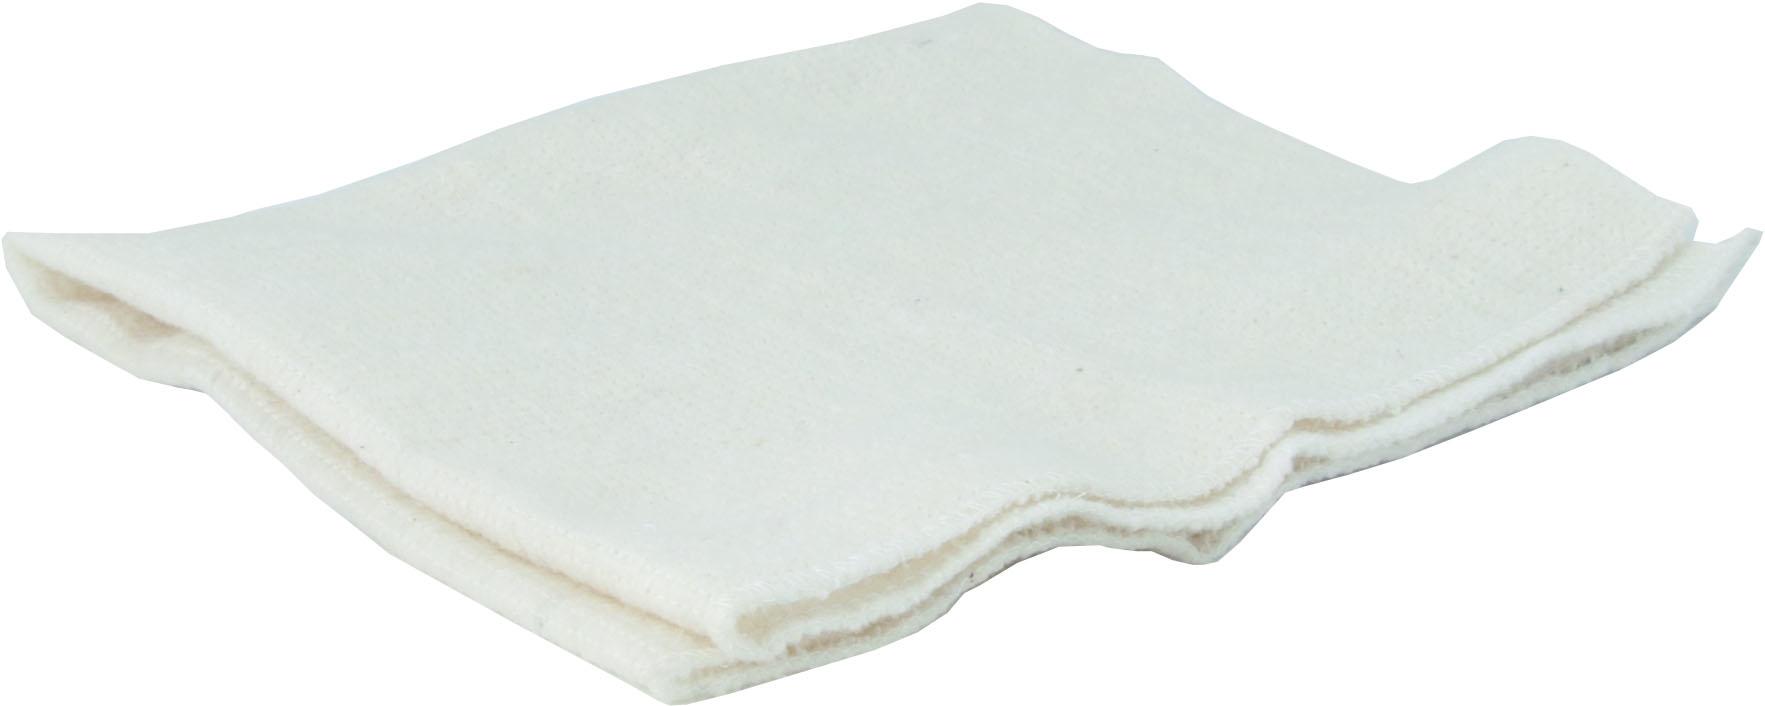 Prachovka bílá, 43x40cm